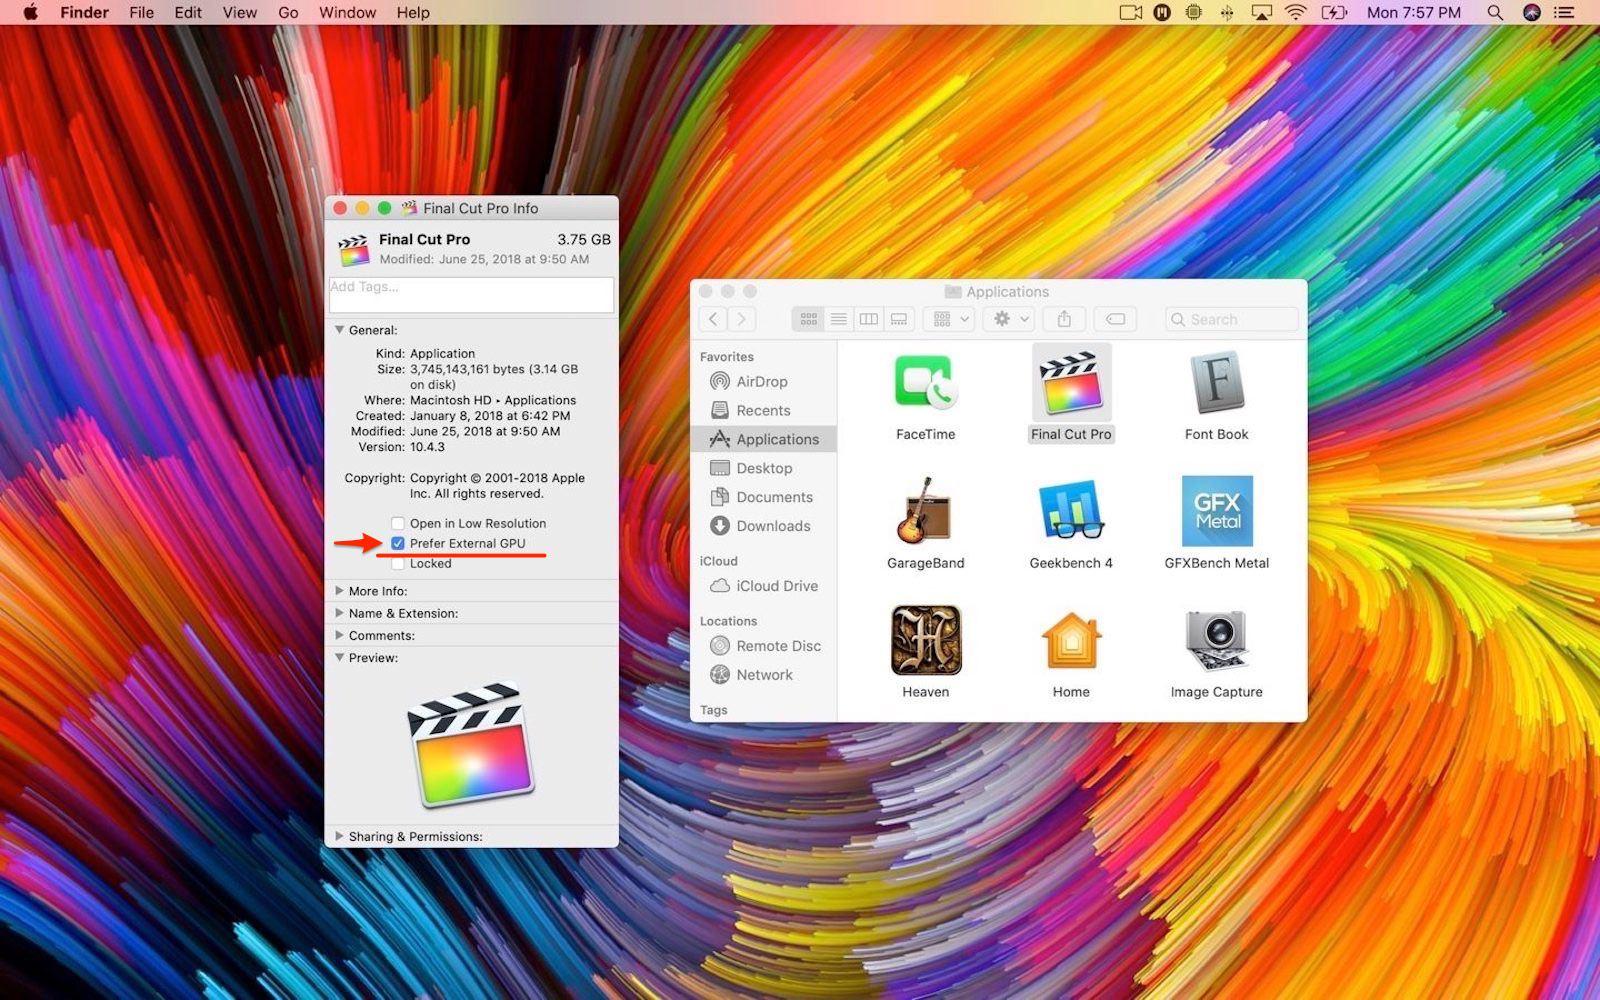 Prefer-External-GPU-macOS-Mojave-2.jpg